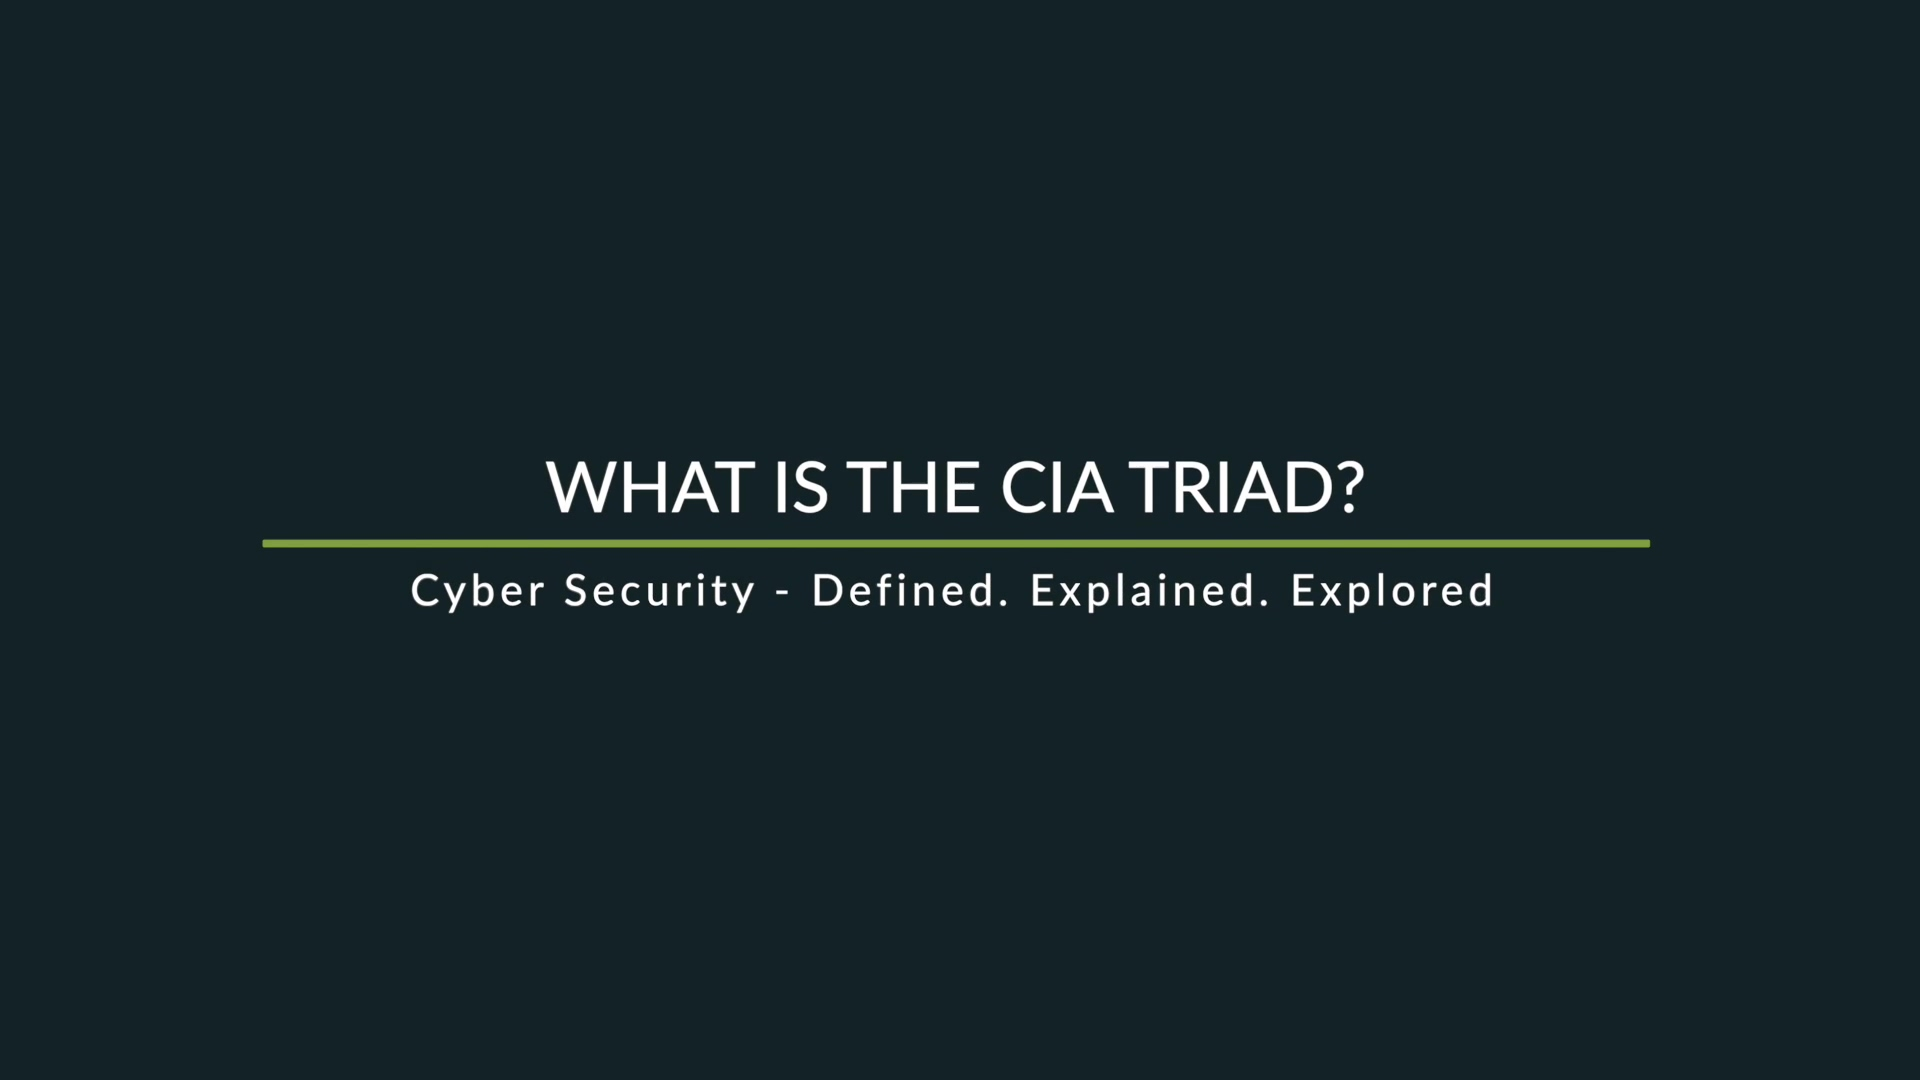 CIA FINAL 1080p HD